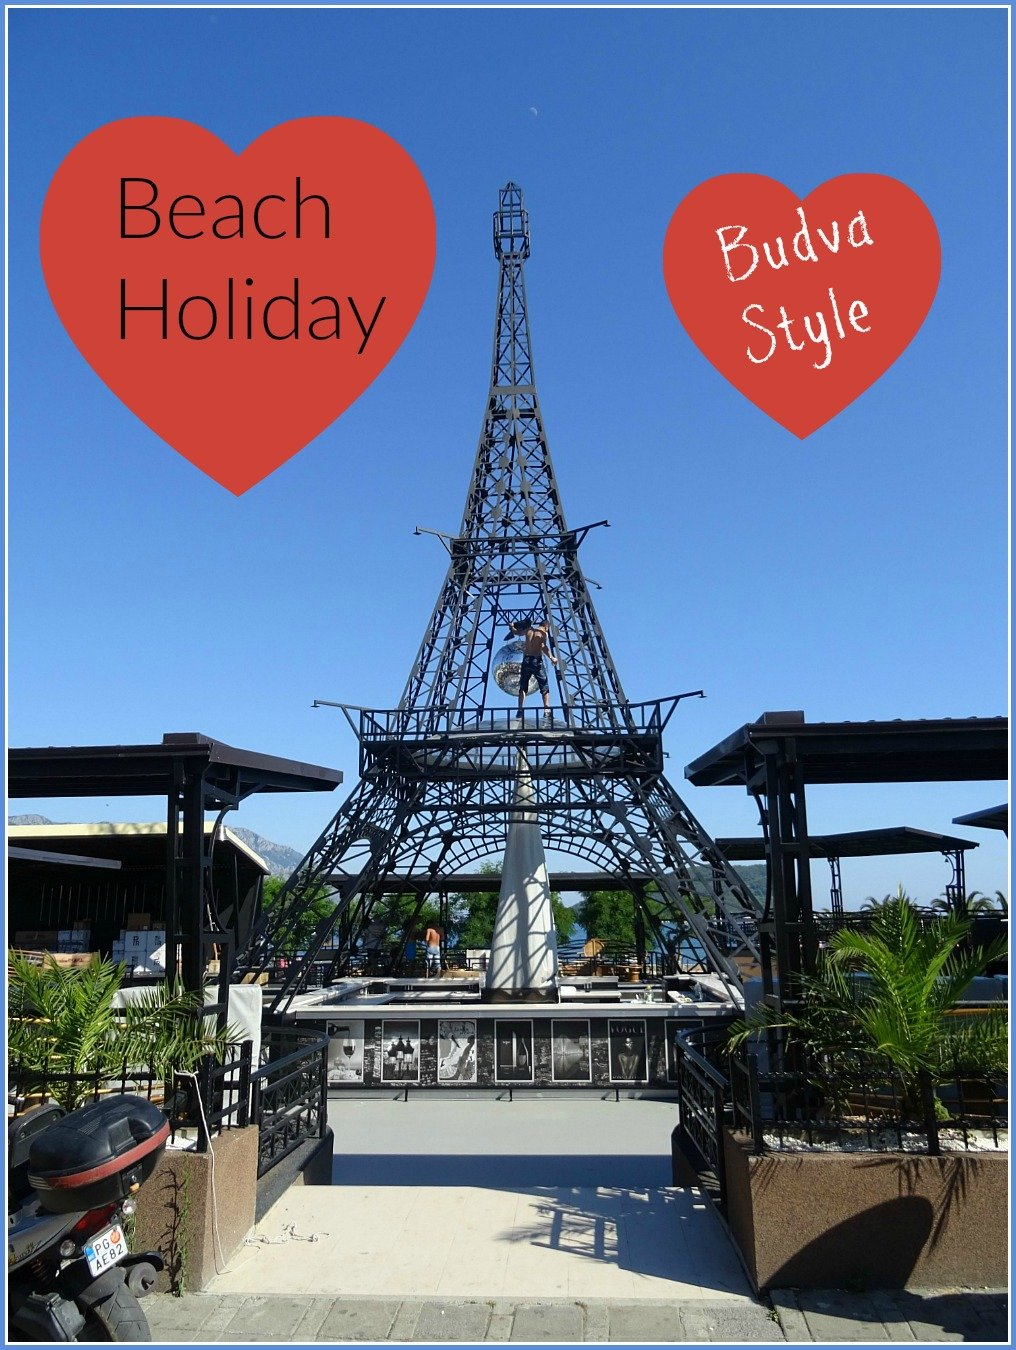 Beach Holiday Budva Style